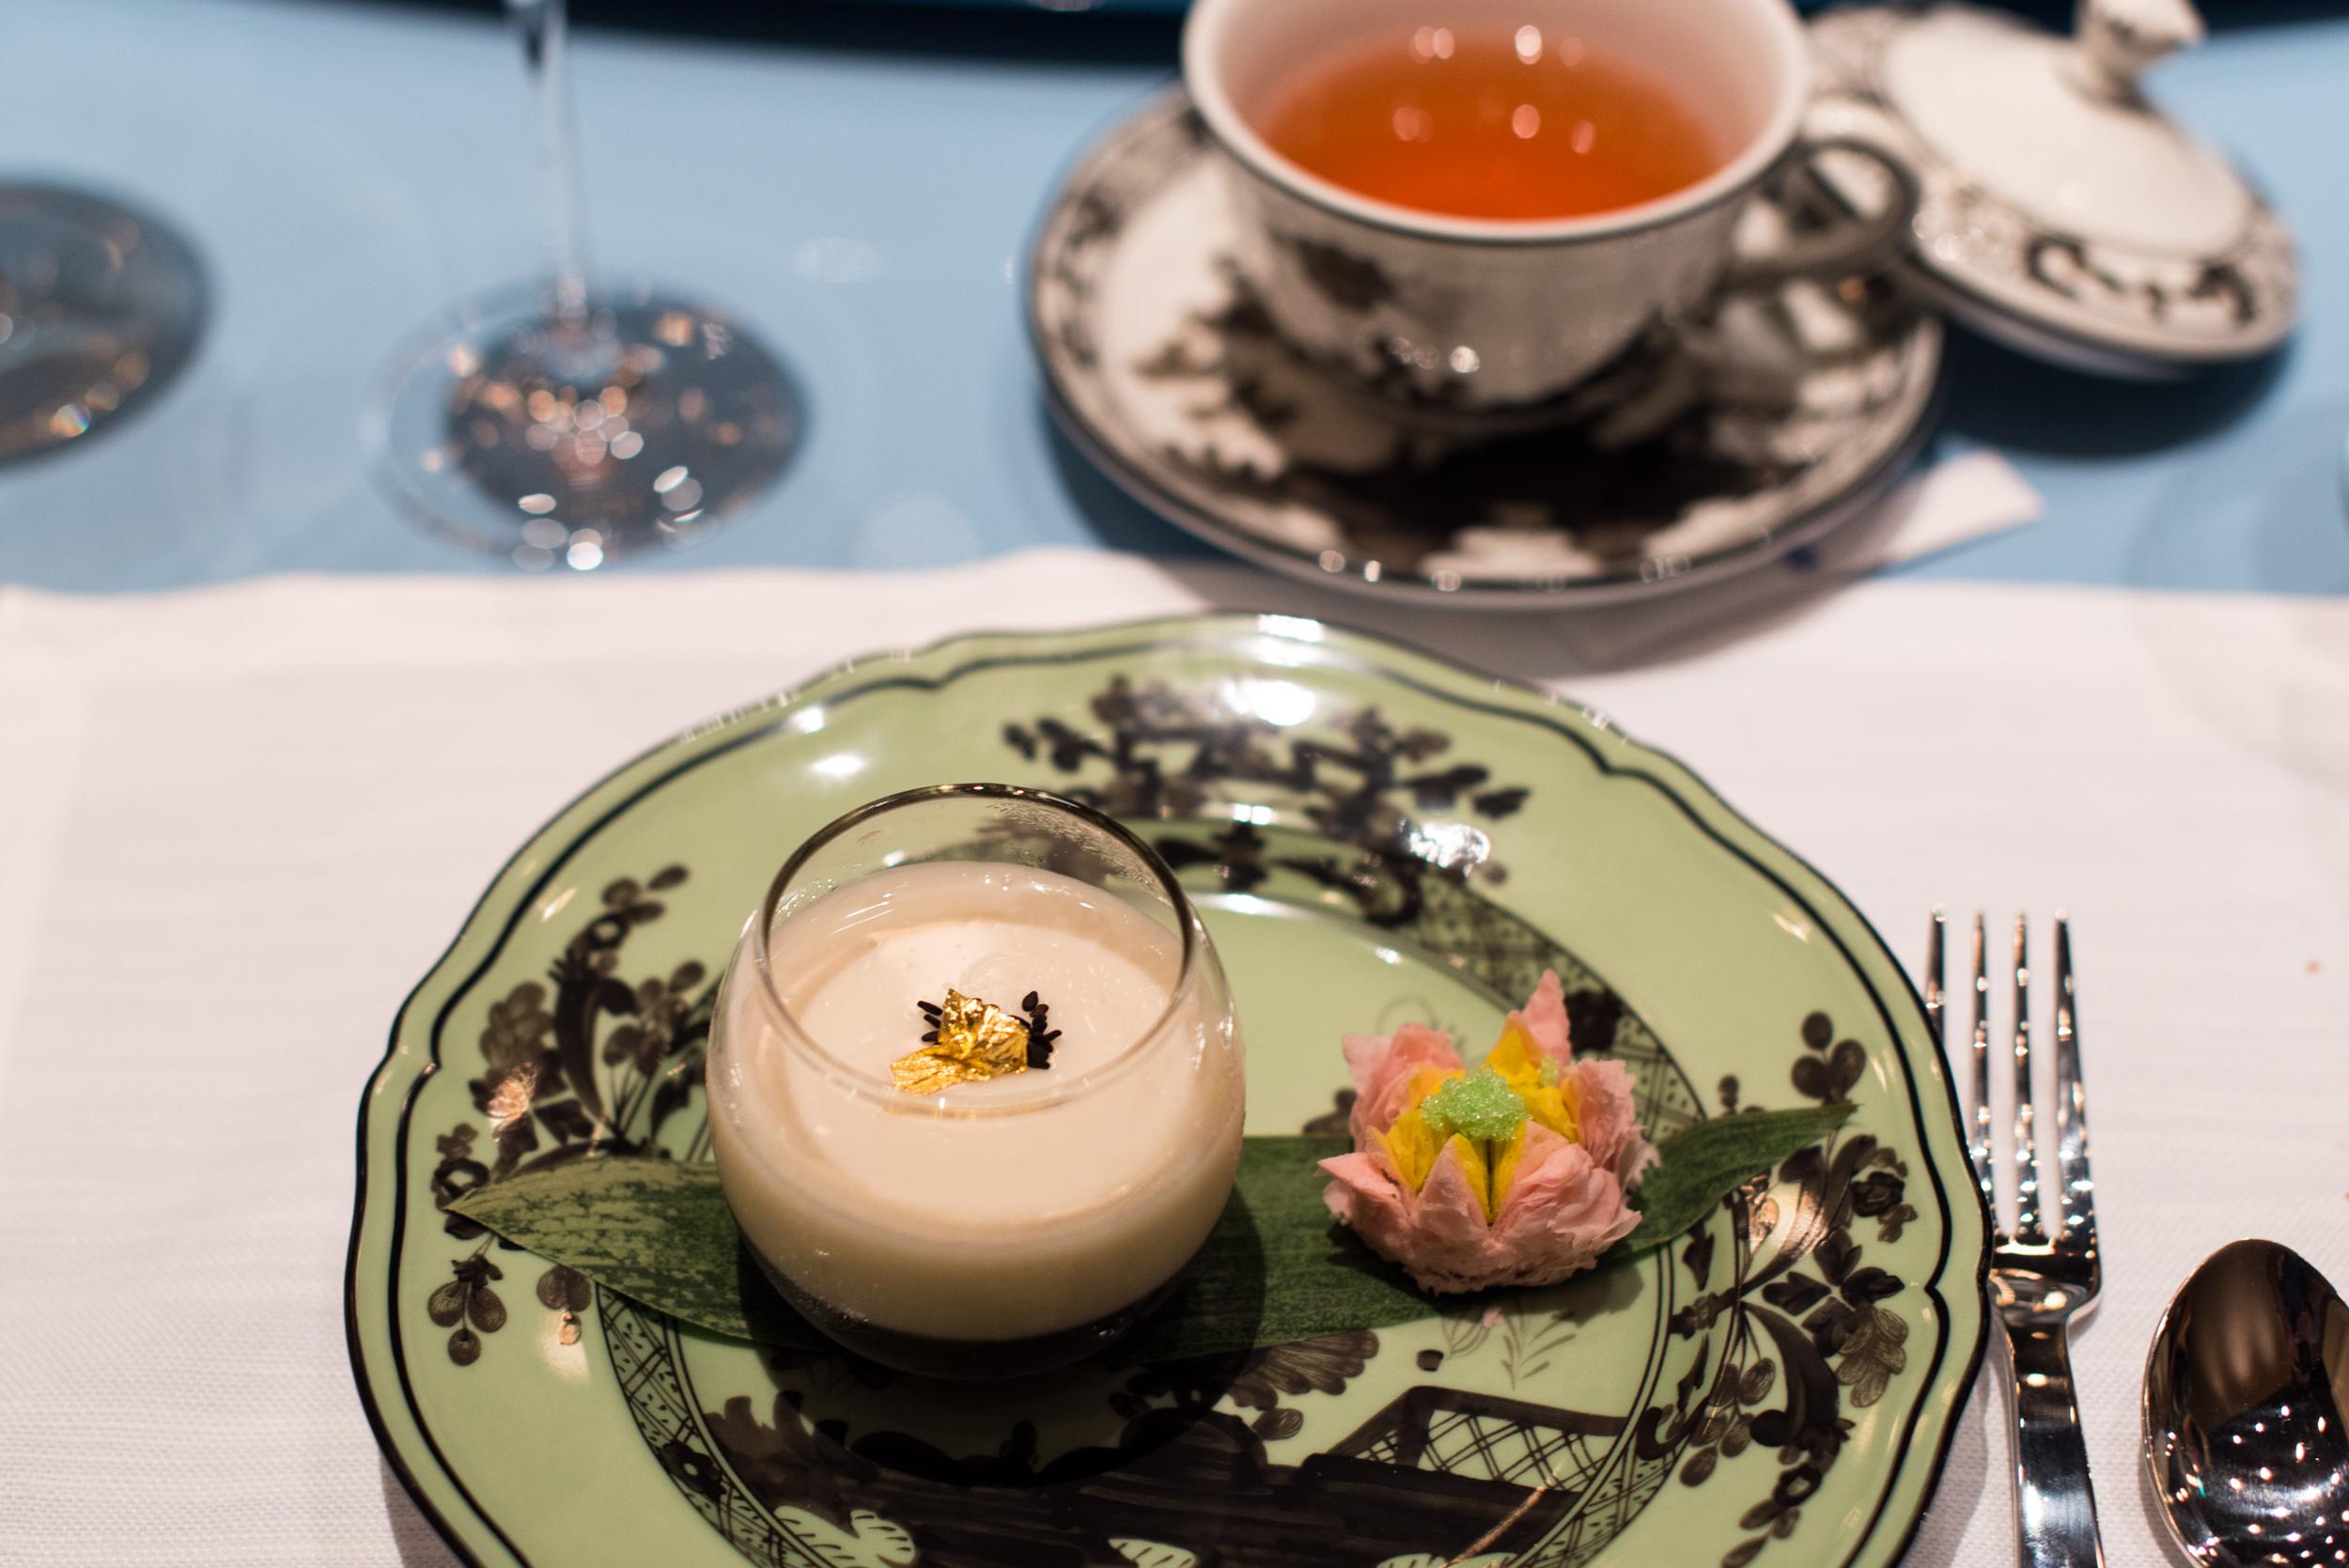 Sweetened Almond Tea, Black Sesame Crispy Red Bean and Green Tea Puff    Summer Pavilion - The Ritz-Carlton, Millenia Singapore